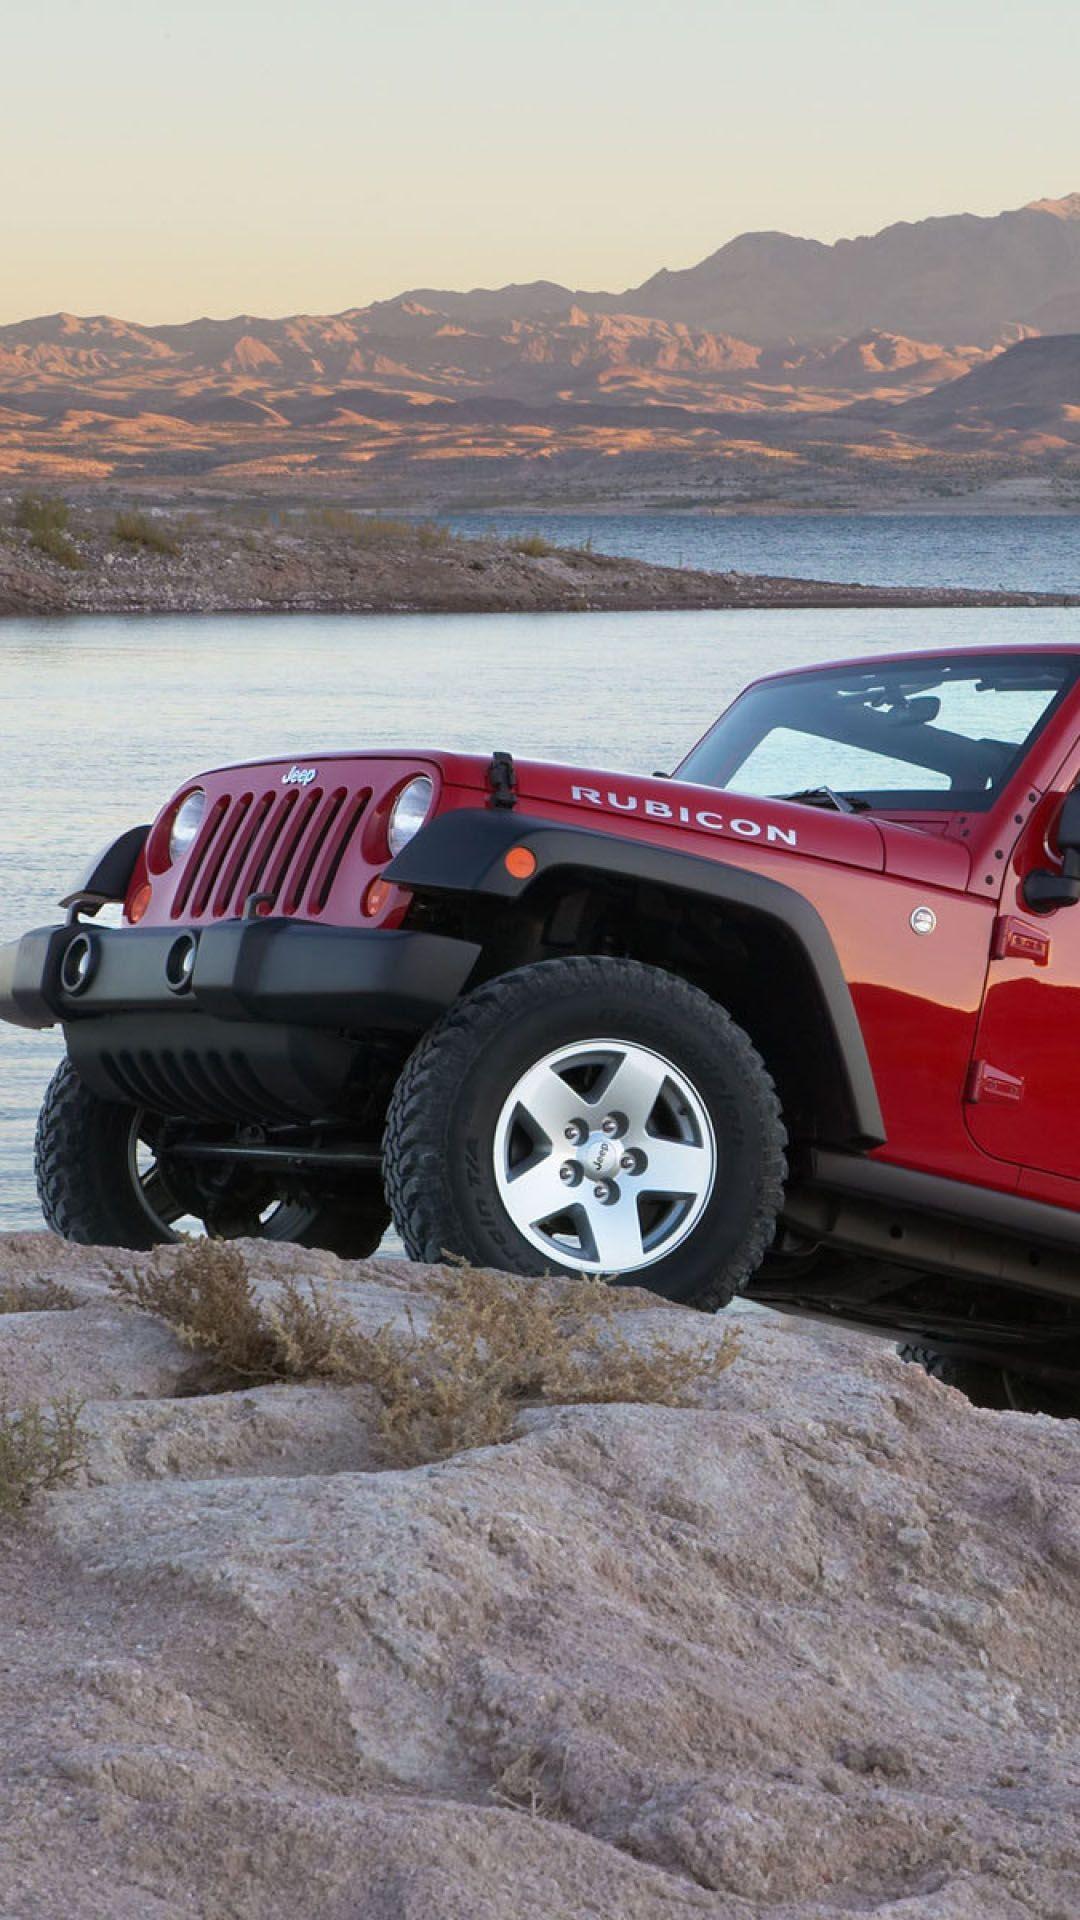 Jeep Grand Cherokee Wallpaper Iphone Plus Cars Wallpaper Hd